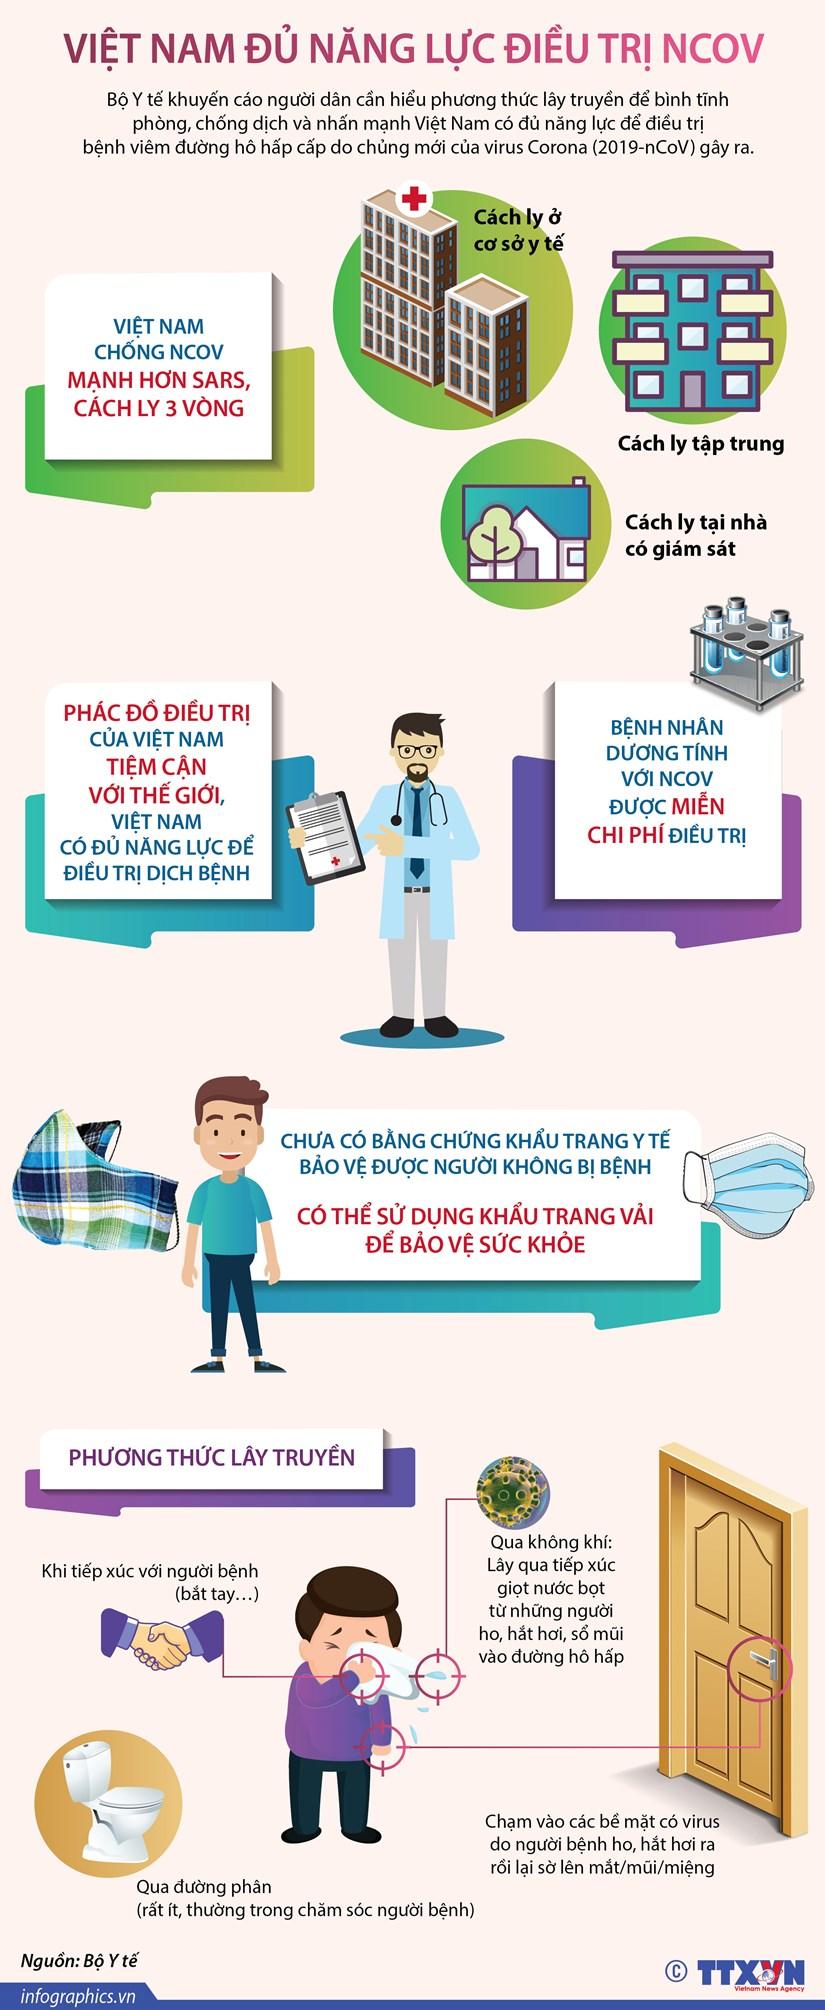 [Infographics] Viet Nam co du nang luc de dieu tri dich benh nCoV hinh anh 1